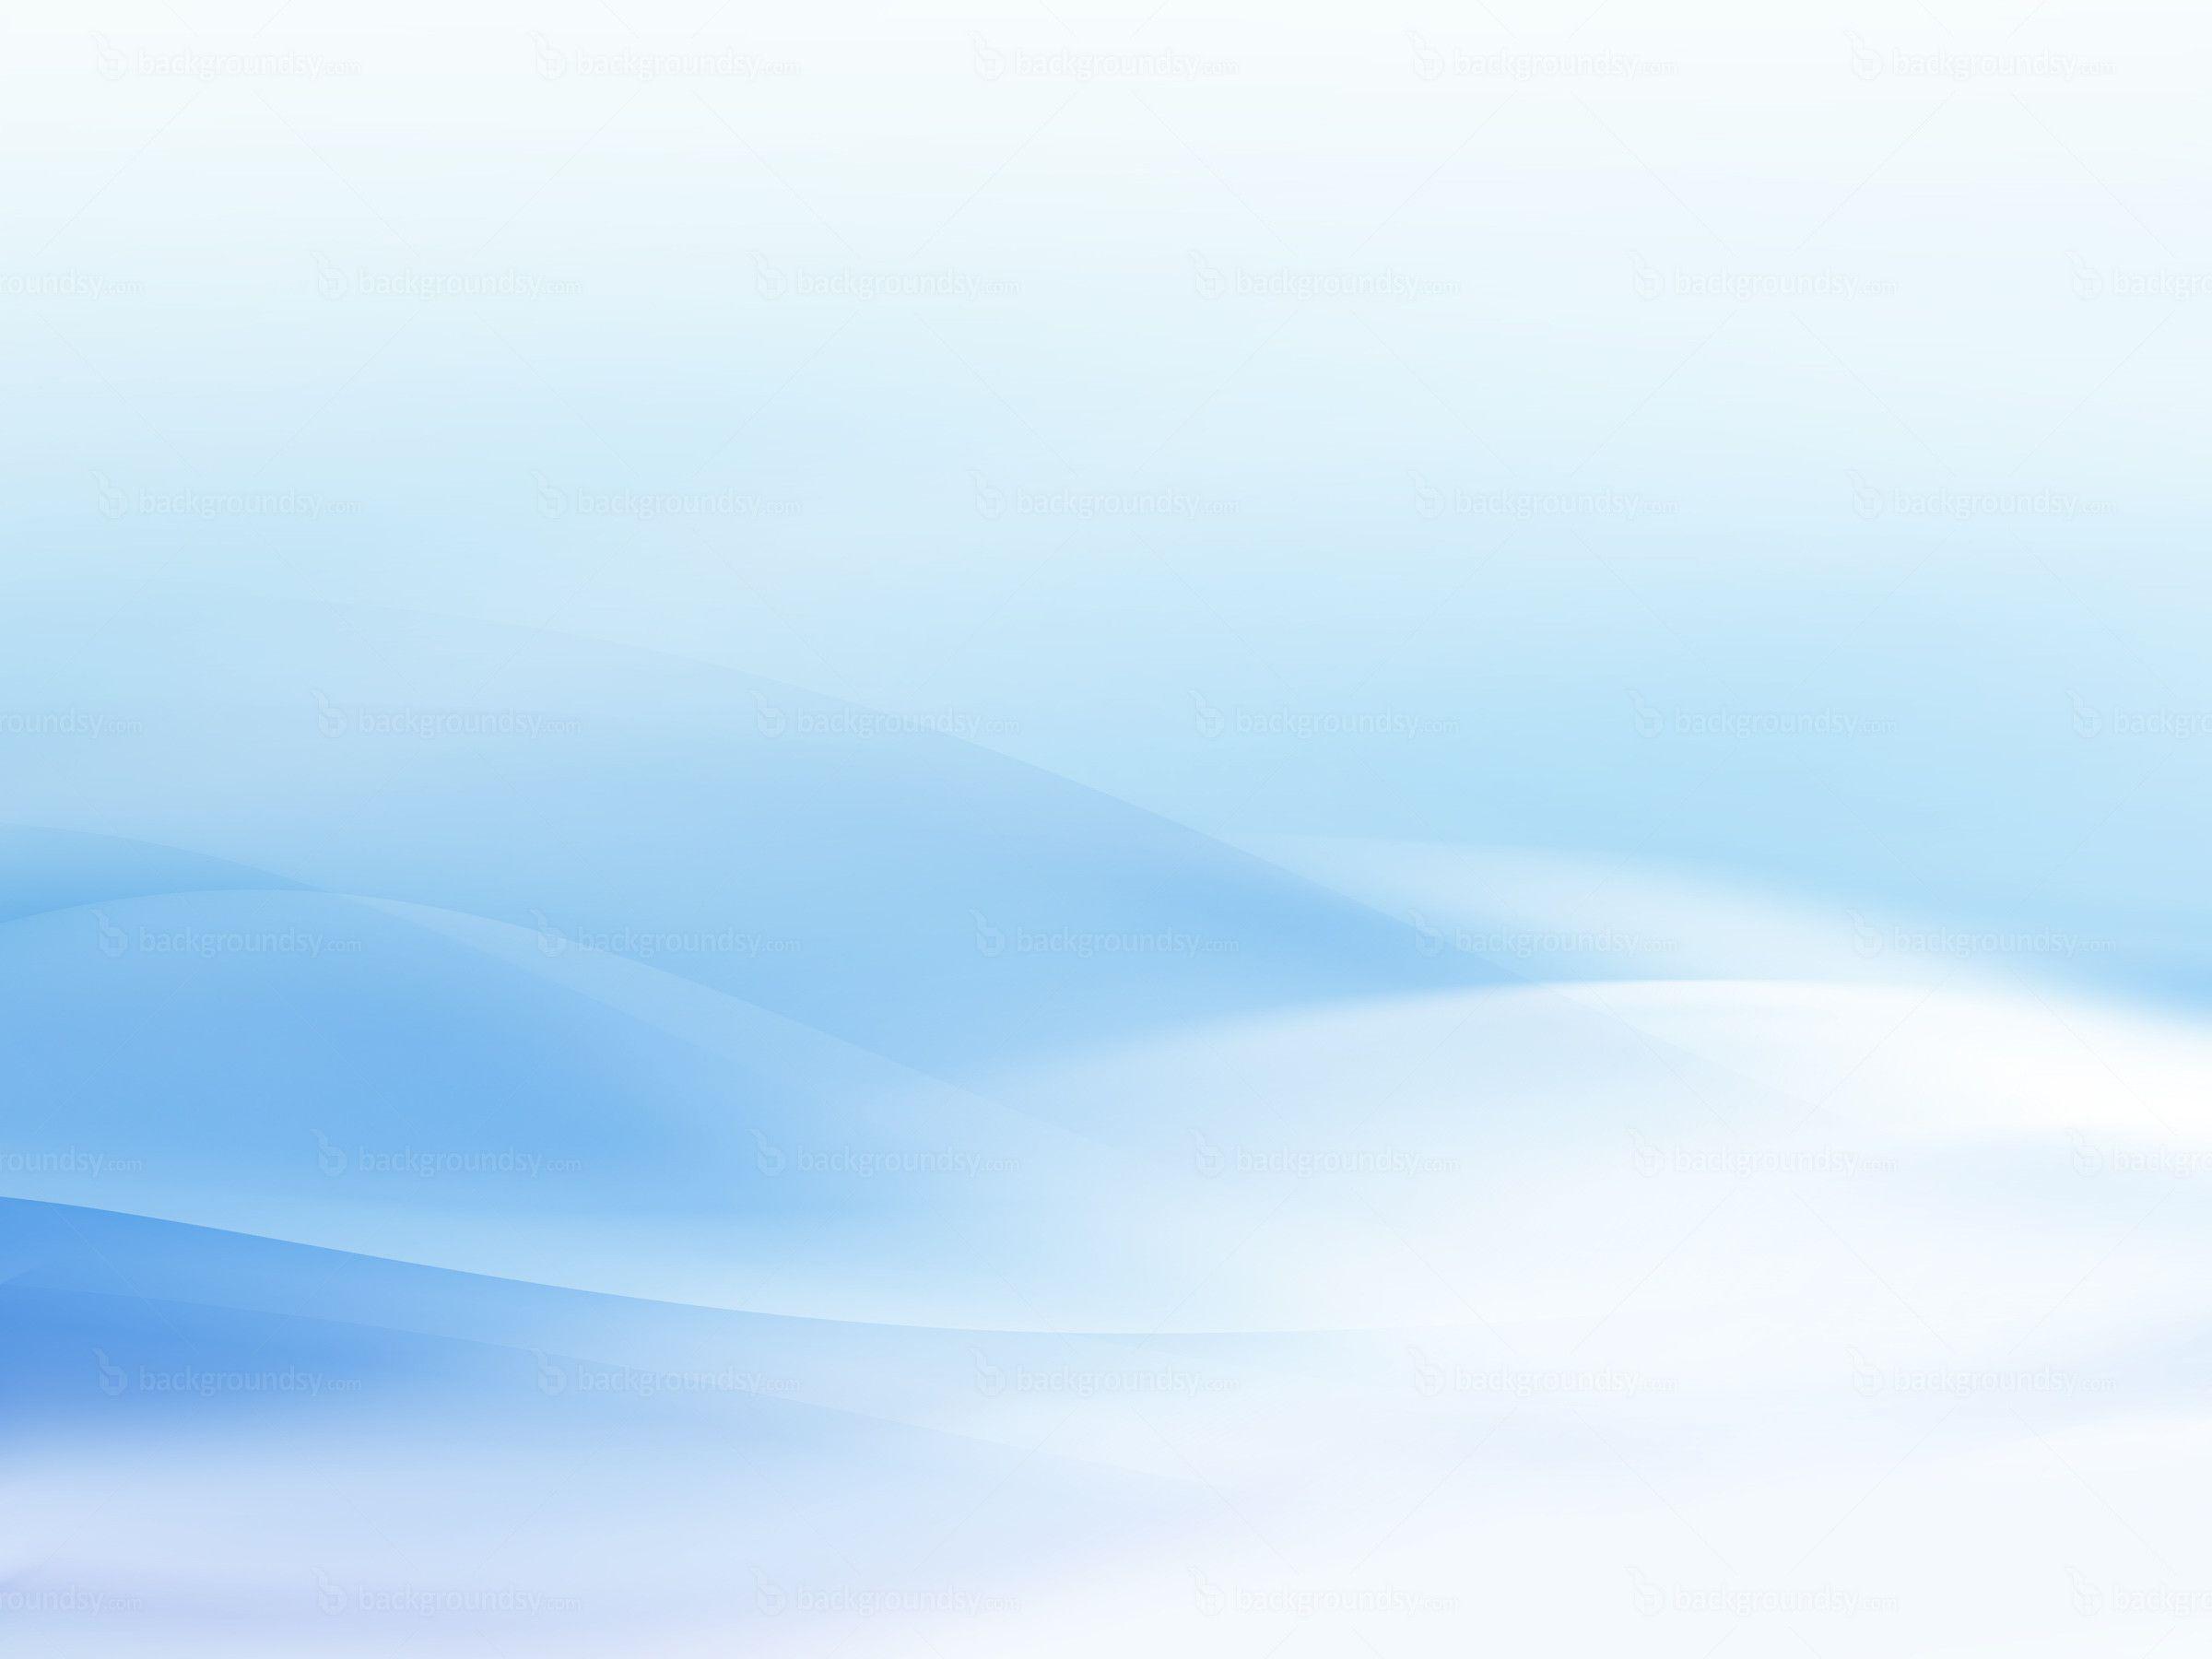 light blue white background - photo #5